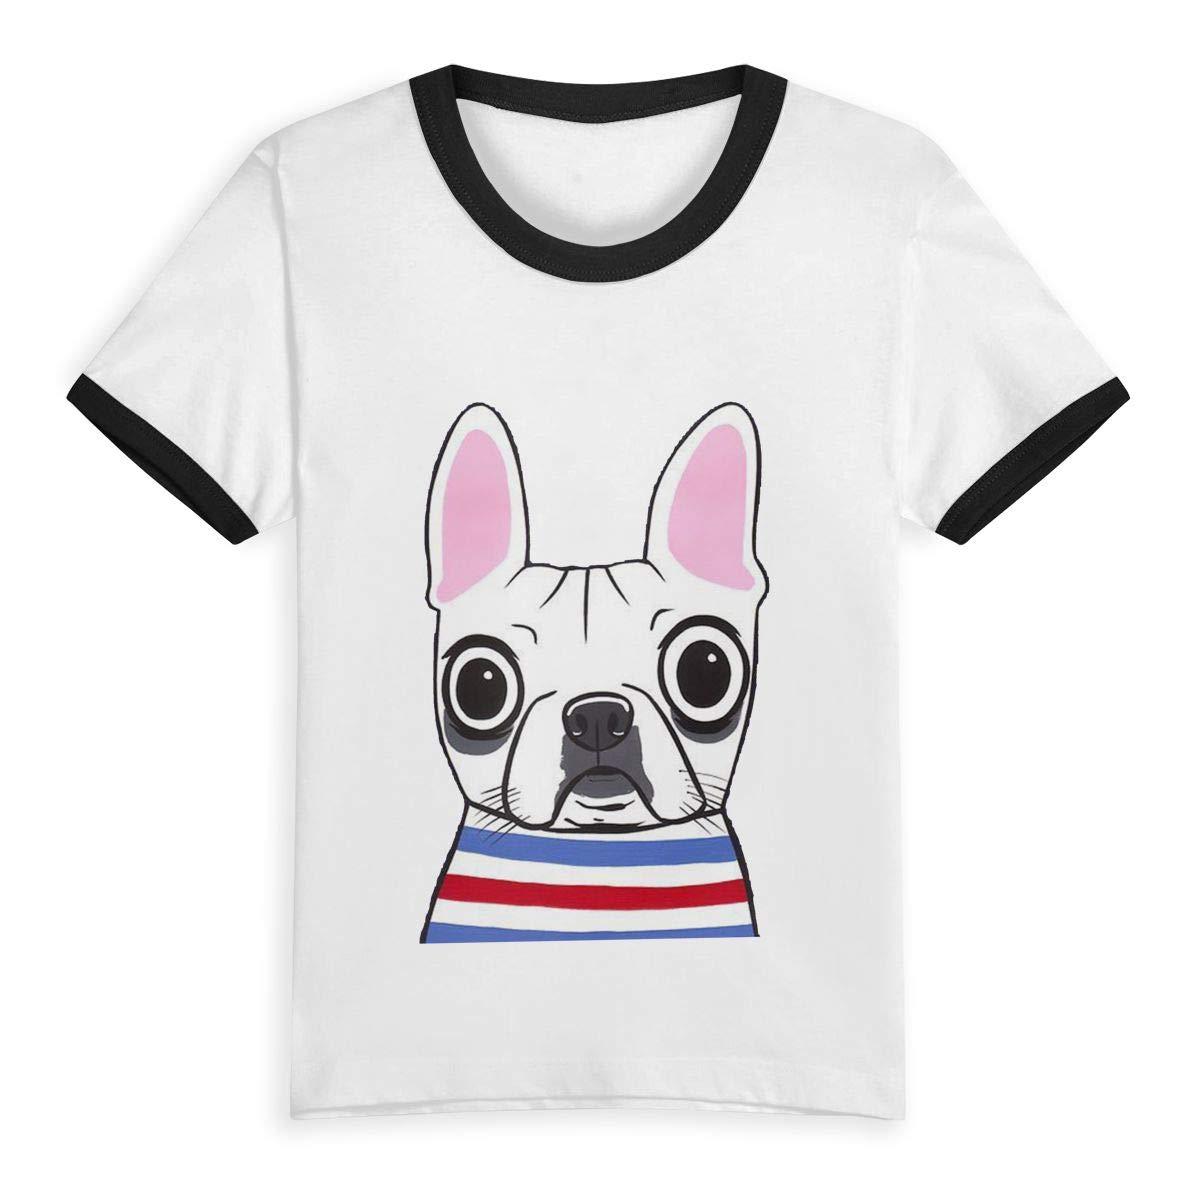 Gomop Cute Cartoon Dog Summer Basic Kids Short Sleeve Tee Short T Shirts